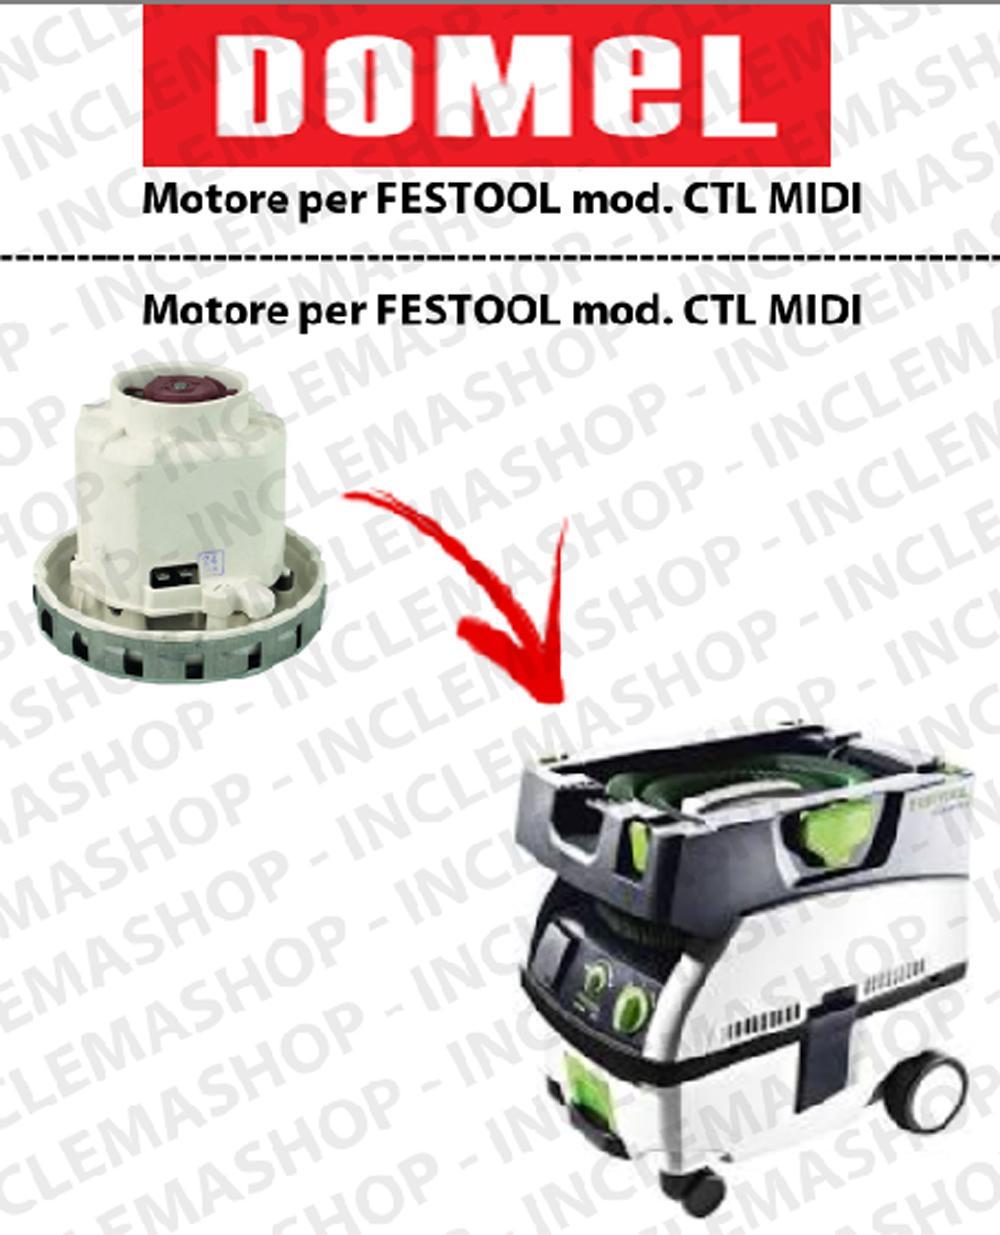 CTL MIDI Saugmotor DOMEL für Staubsauger FESTOOL